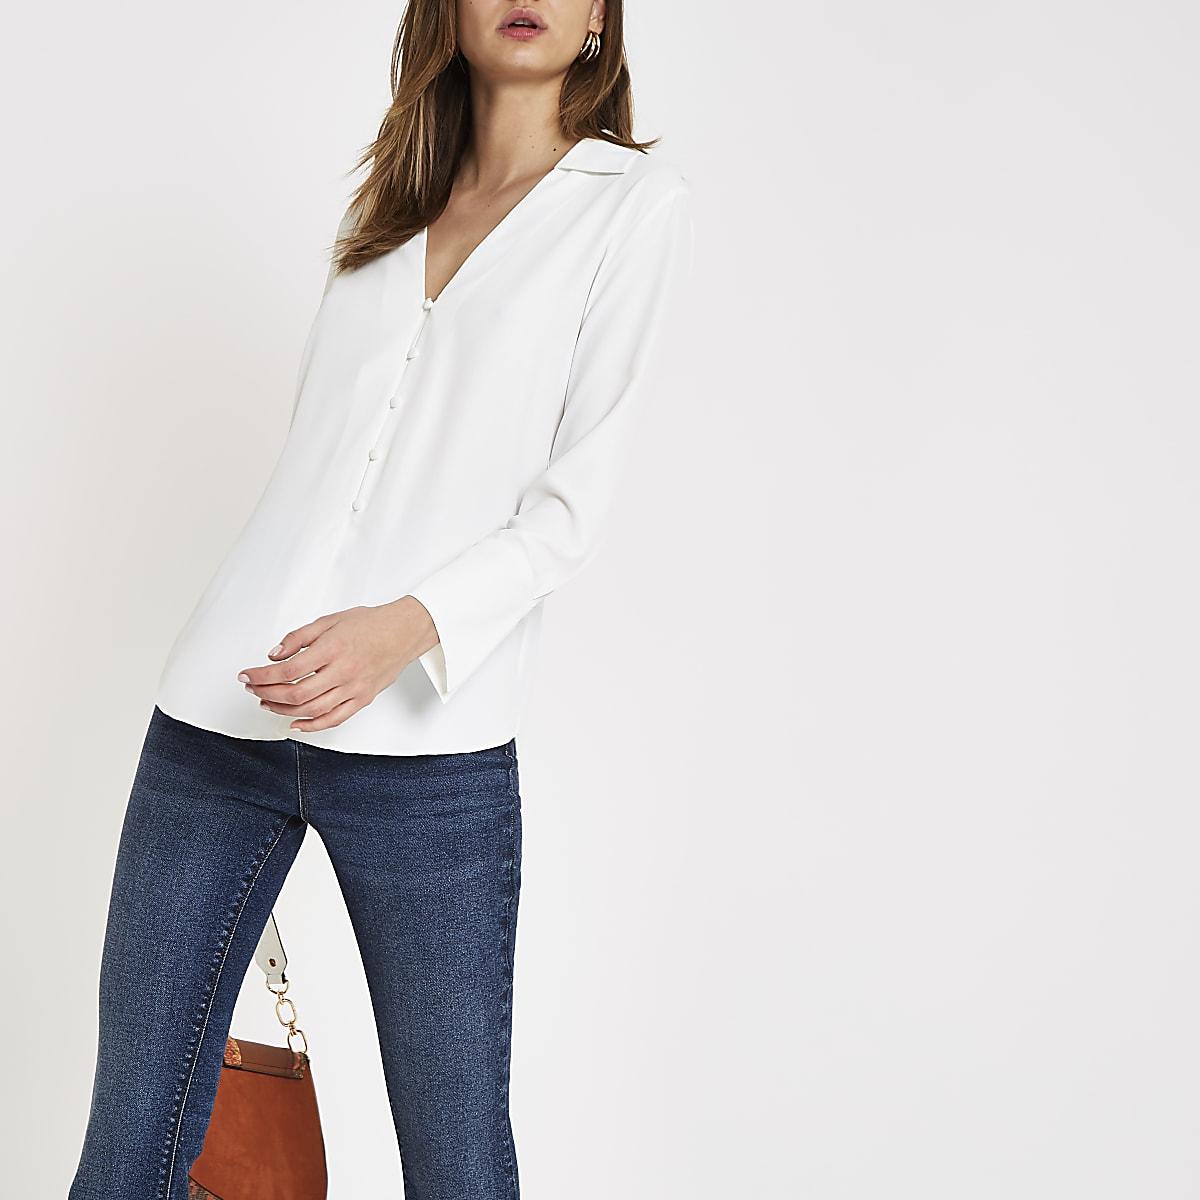 White v neck button through shirt